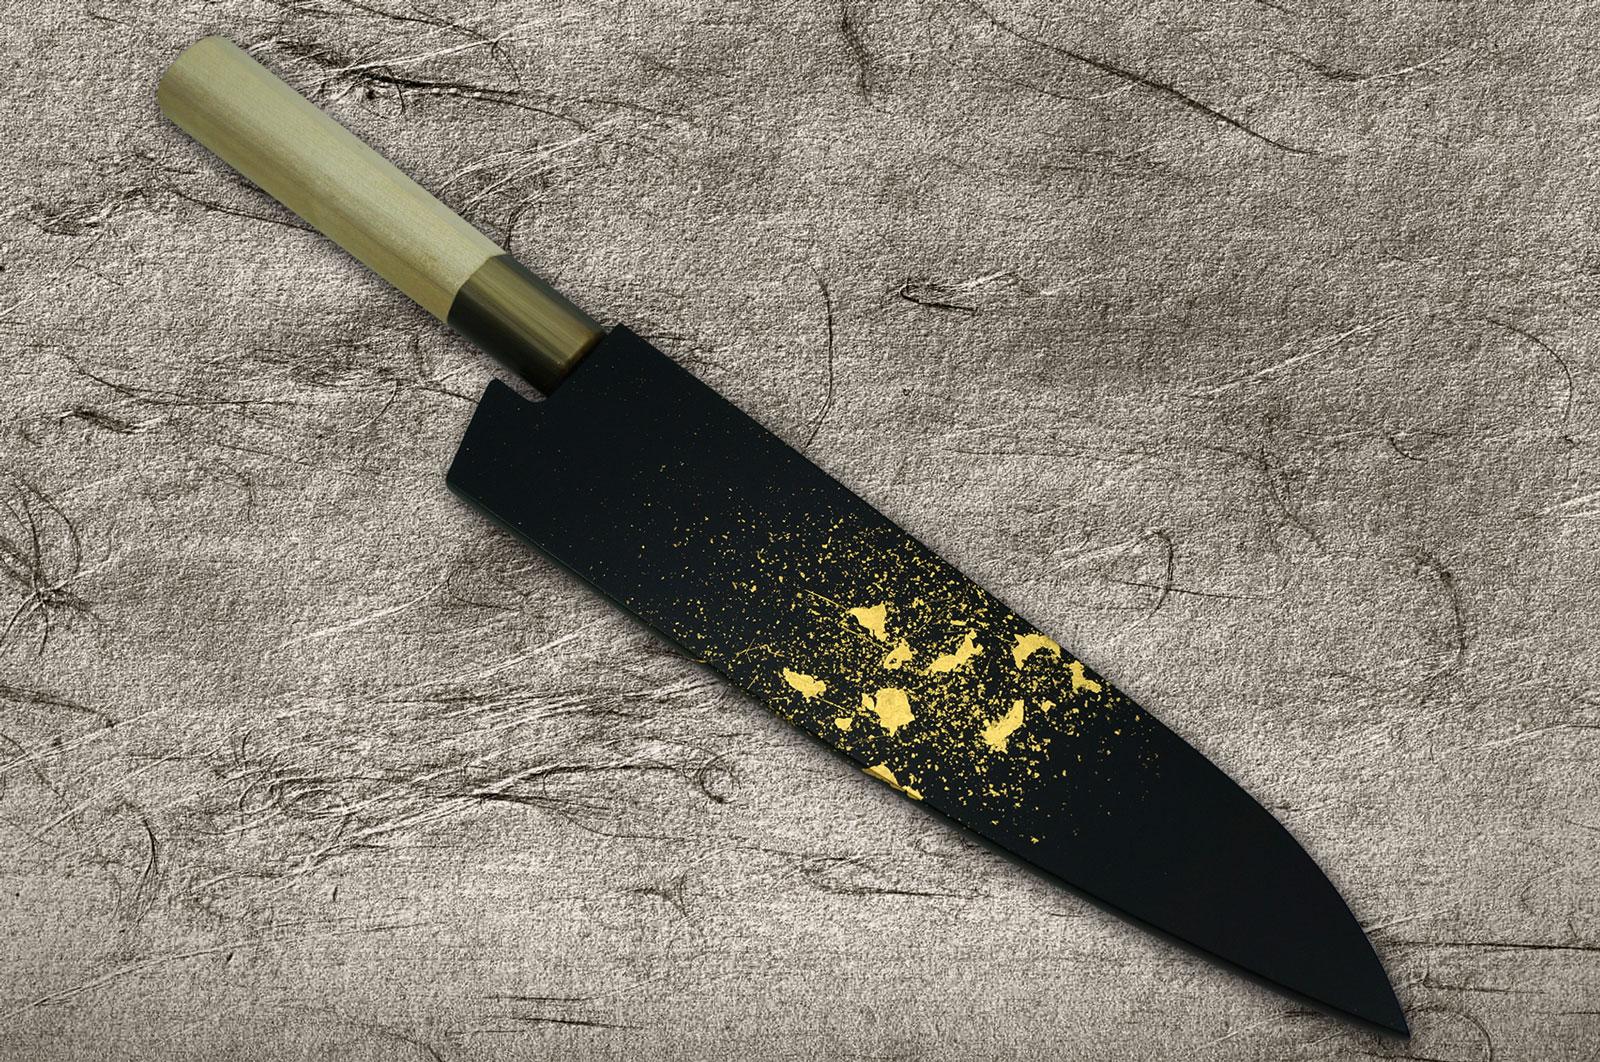 Saya Sheath with Genuine 24K Japanese Gold Leaf for Kitchen